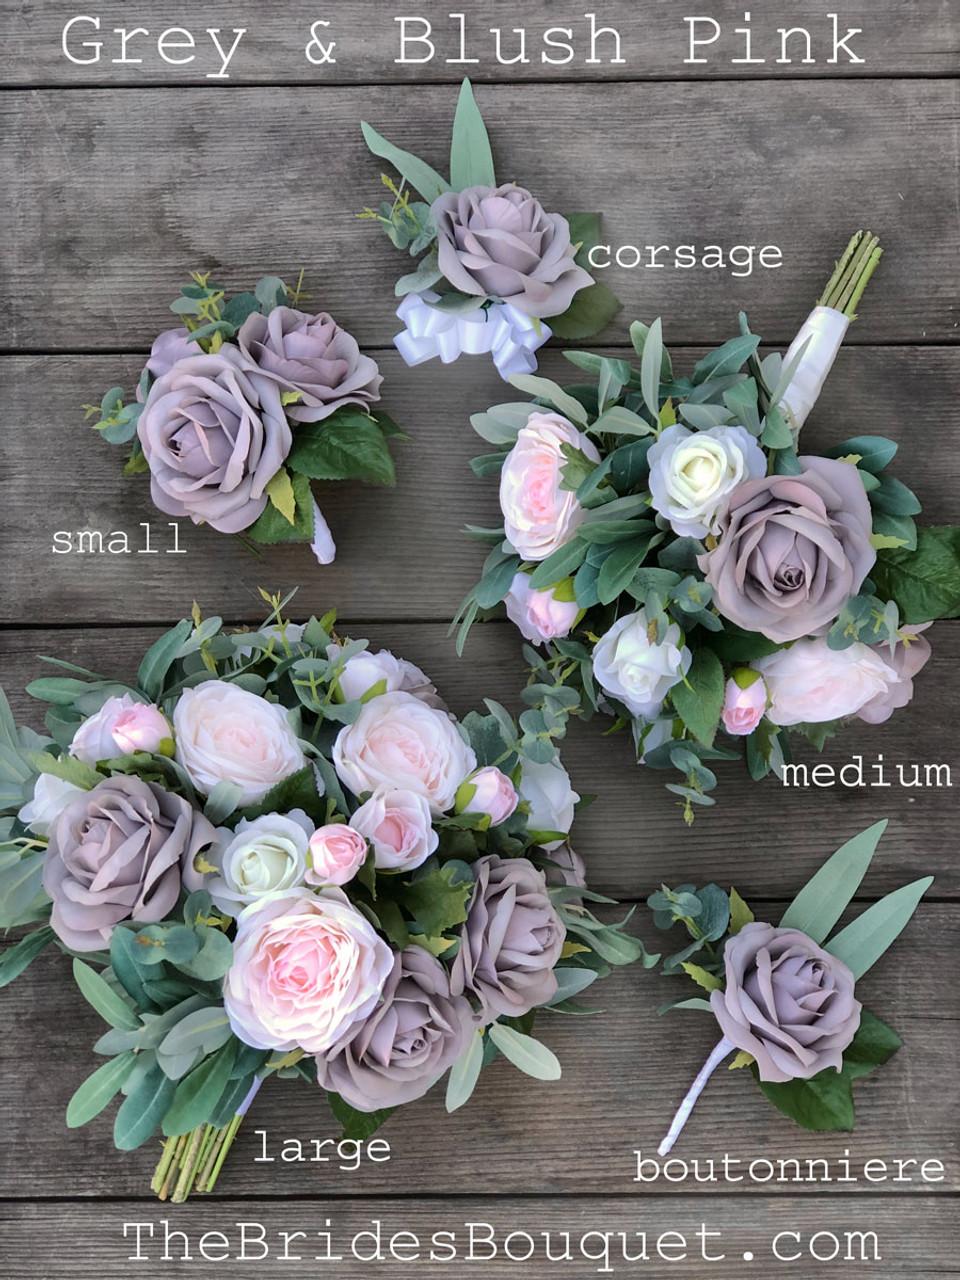 Wedding Bouquet Blush Pink Silver Grey Bridal Bouquet Mixed With Eucalyptus Large Thebridesbouquet Com